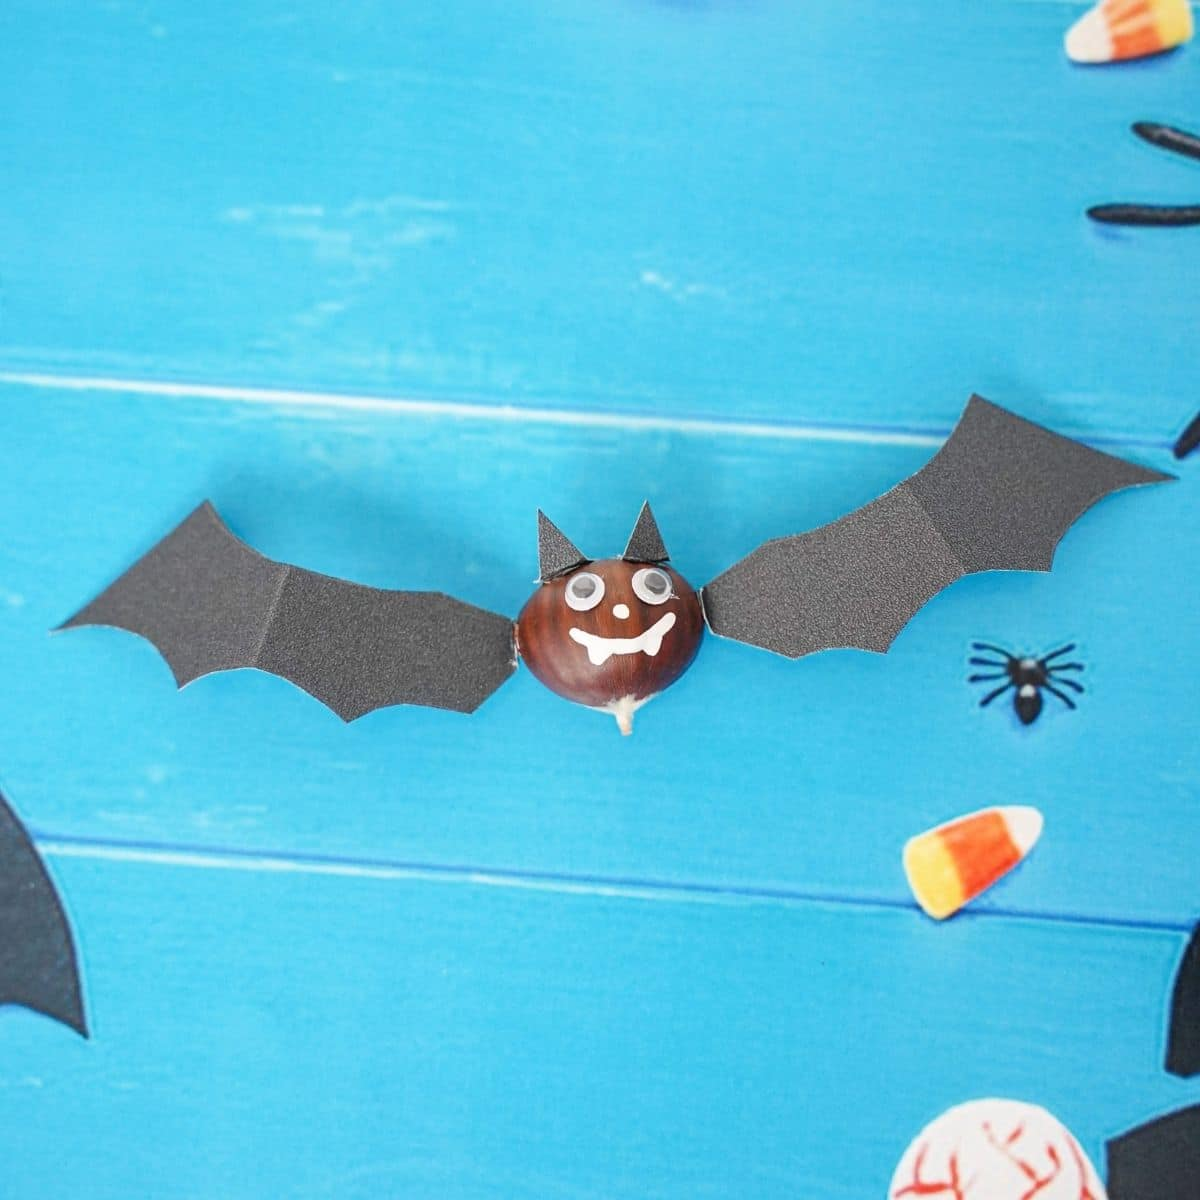 Halloween bat decoration on blue table